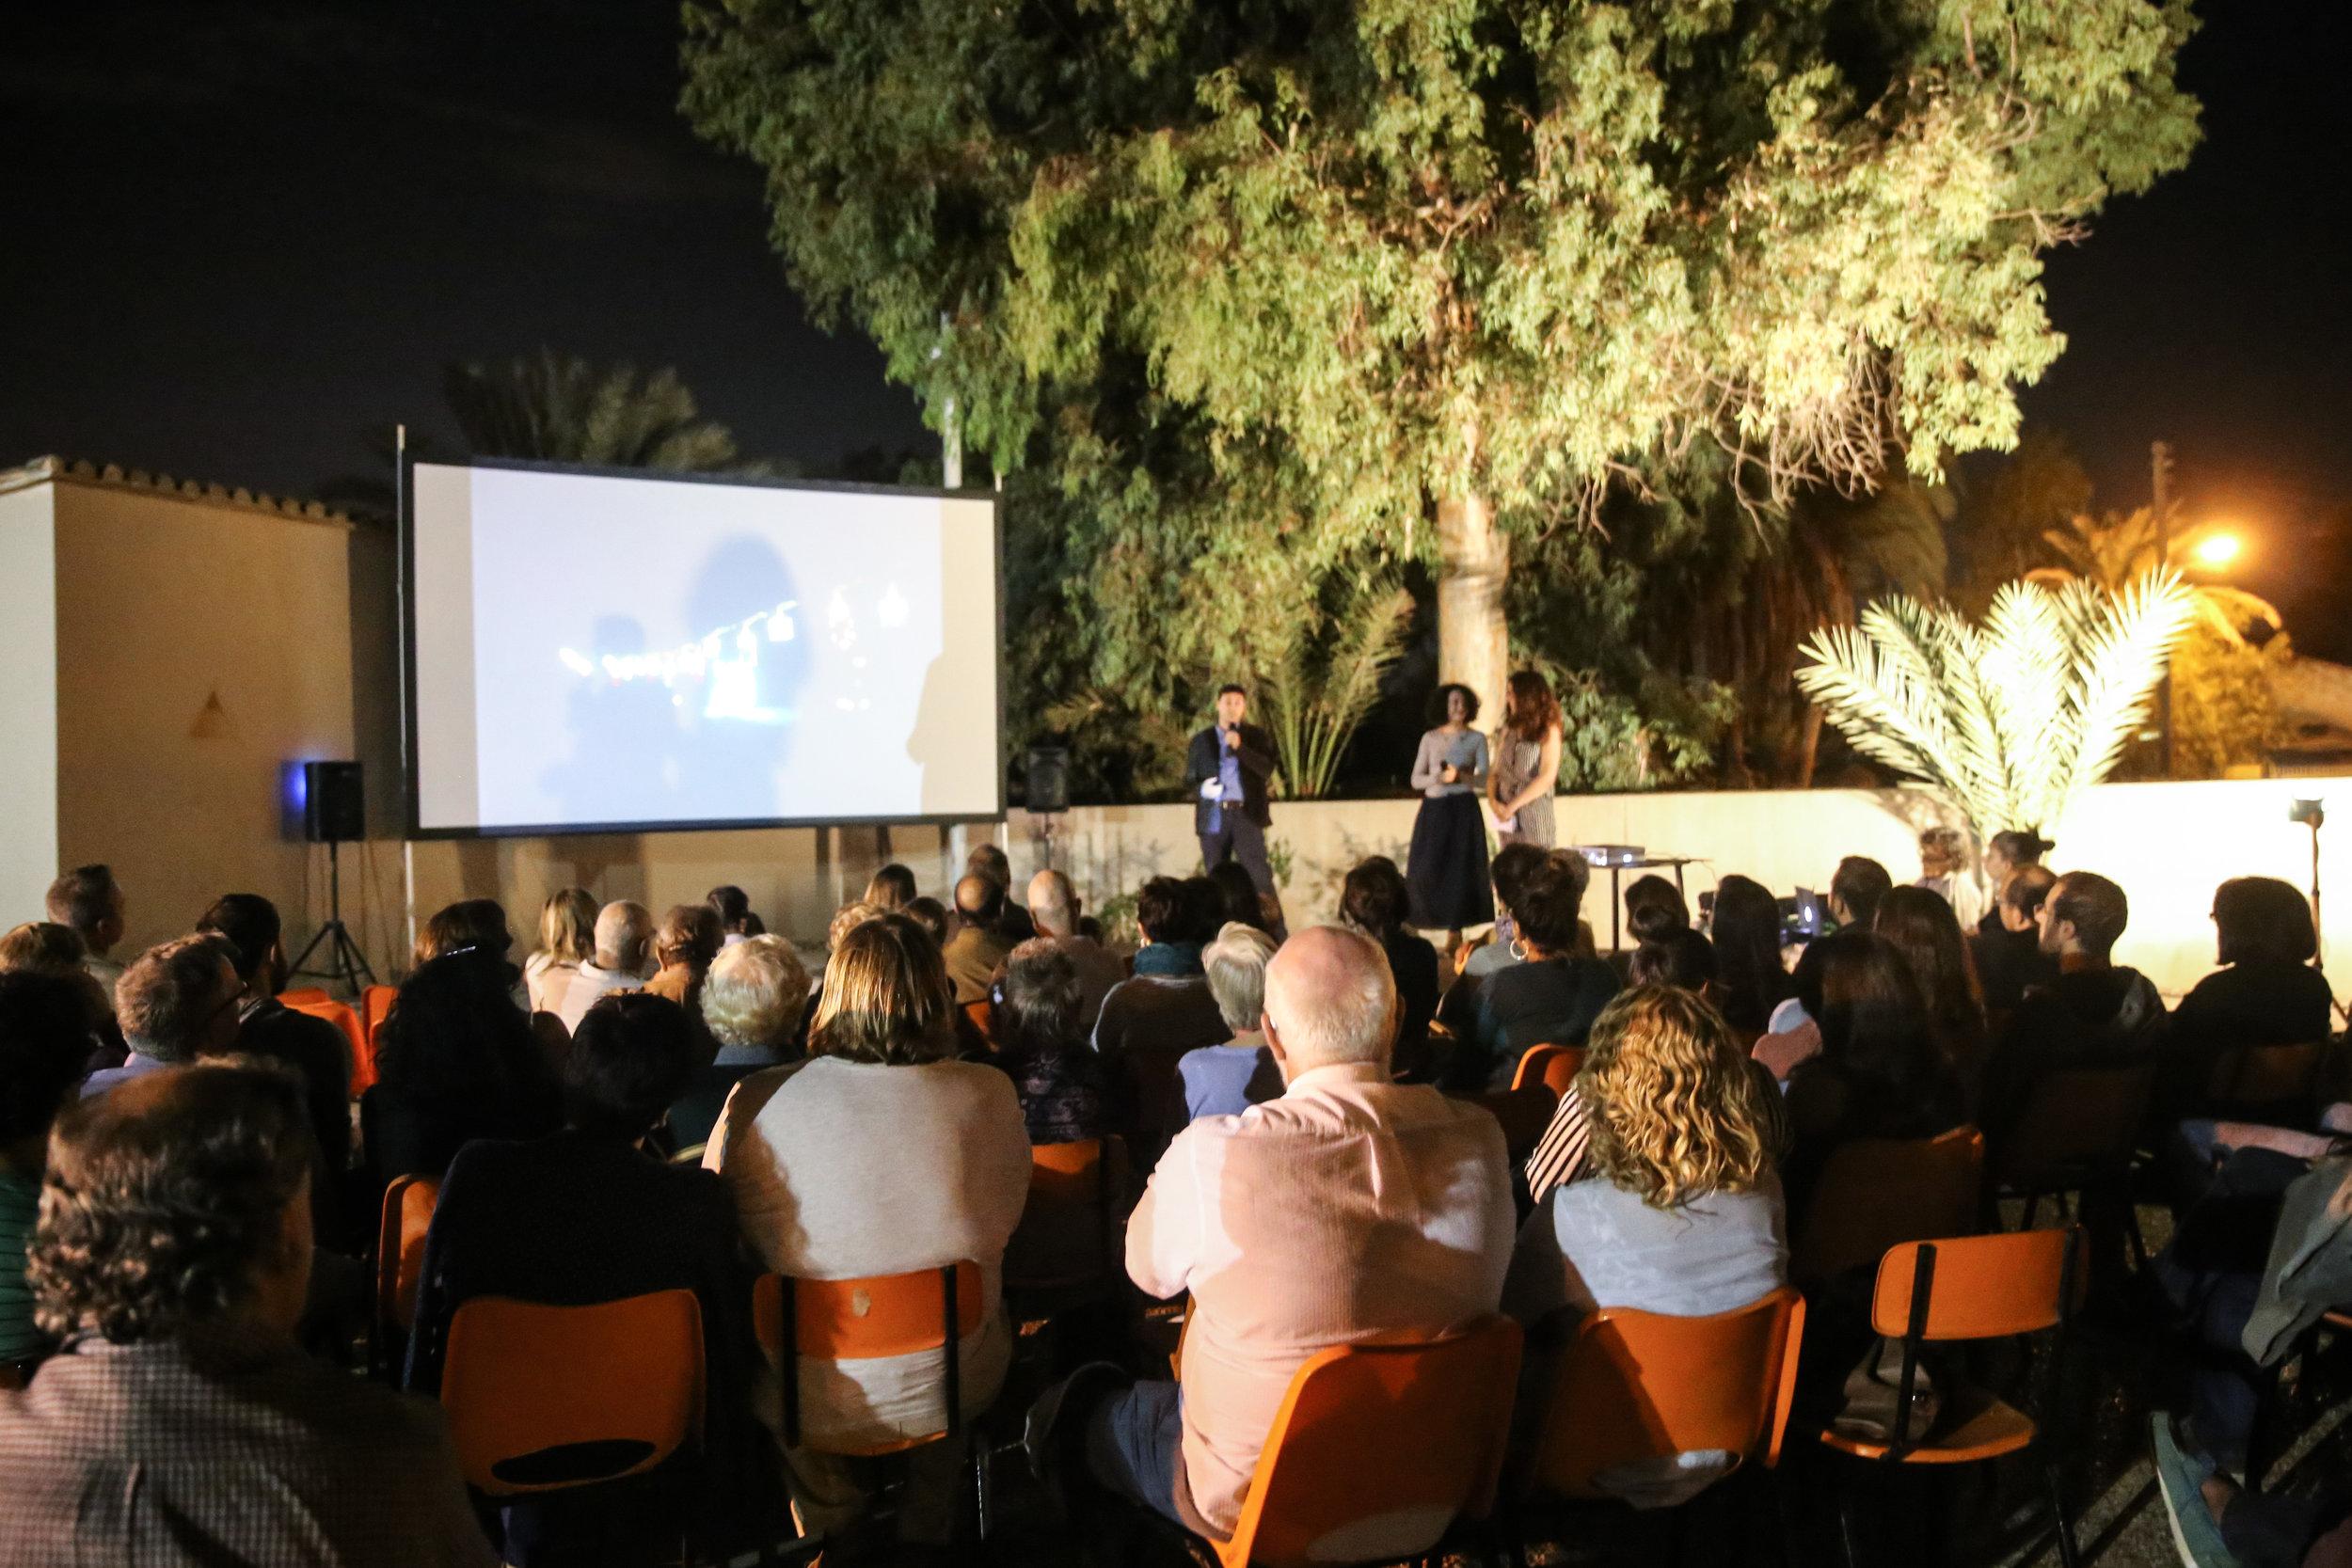 outdoor film screening in Kaimakli, Nicosia, Cyprus